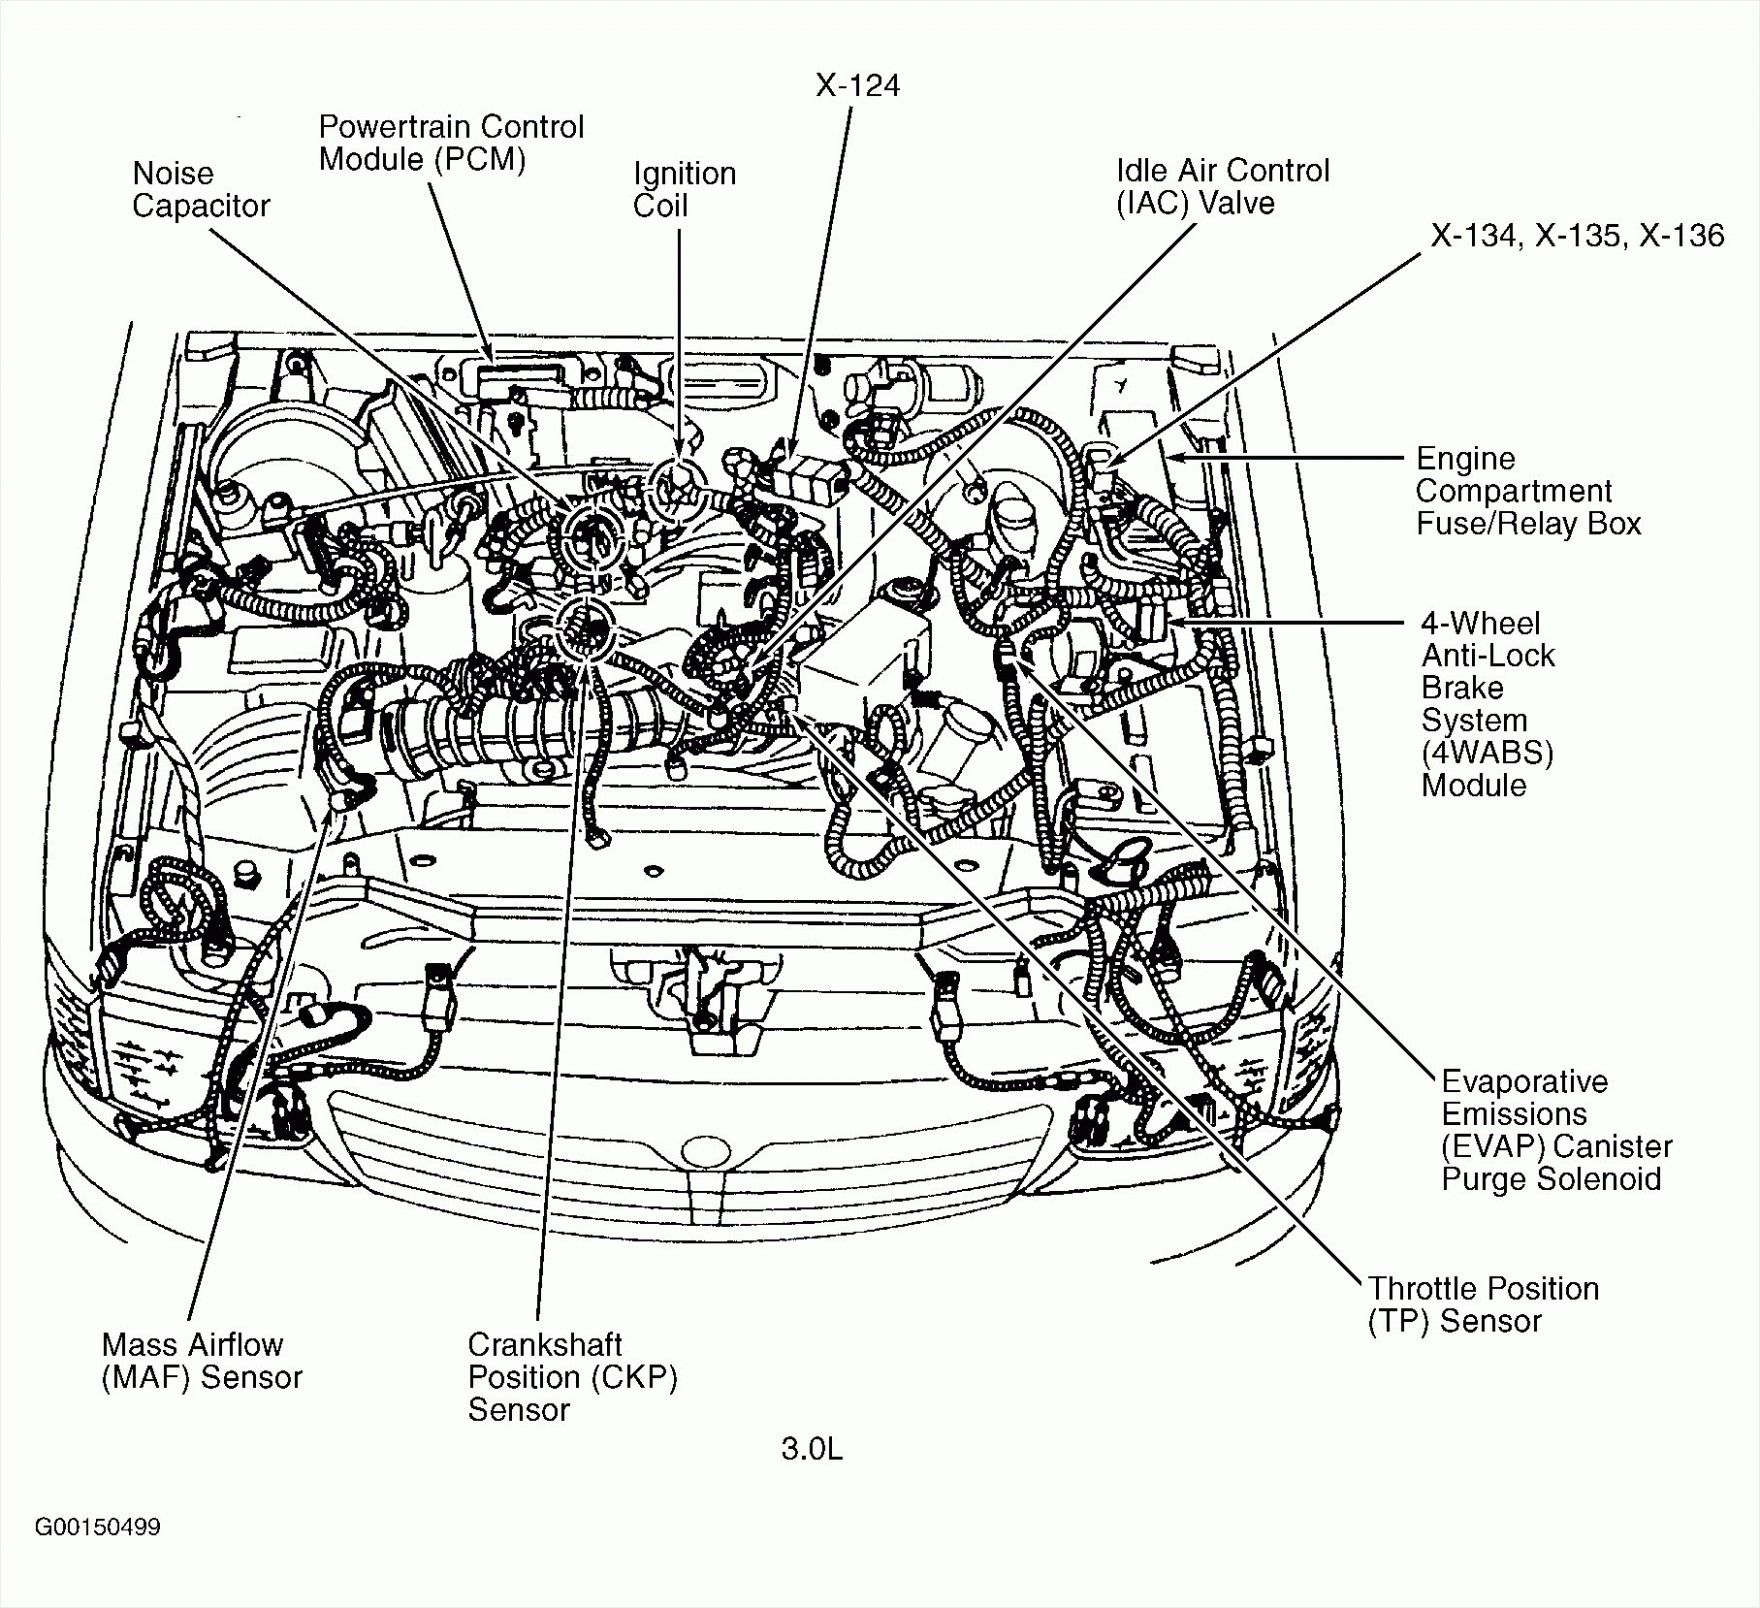 2003 Cadillac Cts Factory Wiring Diagram